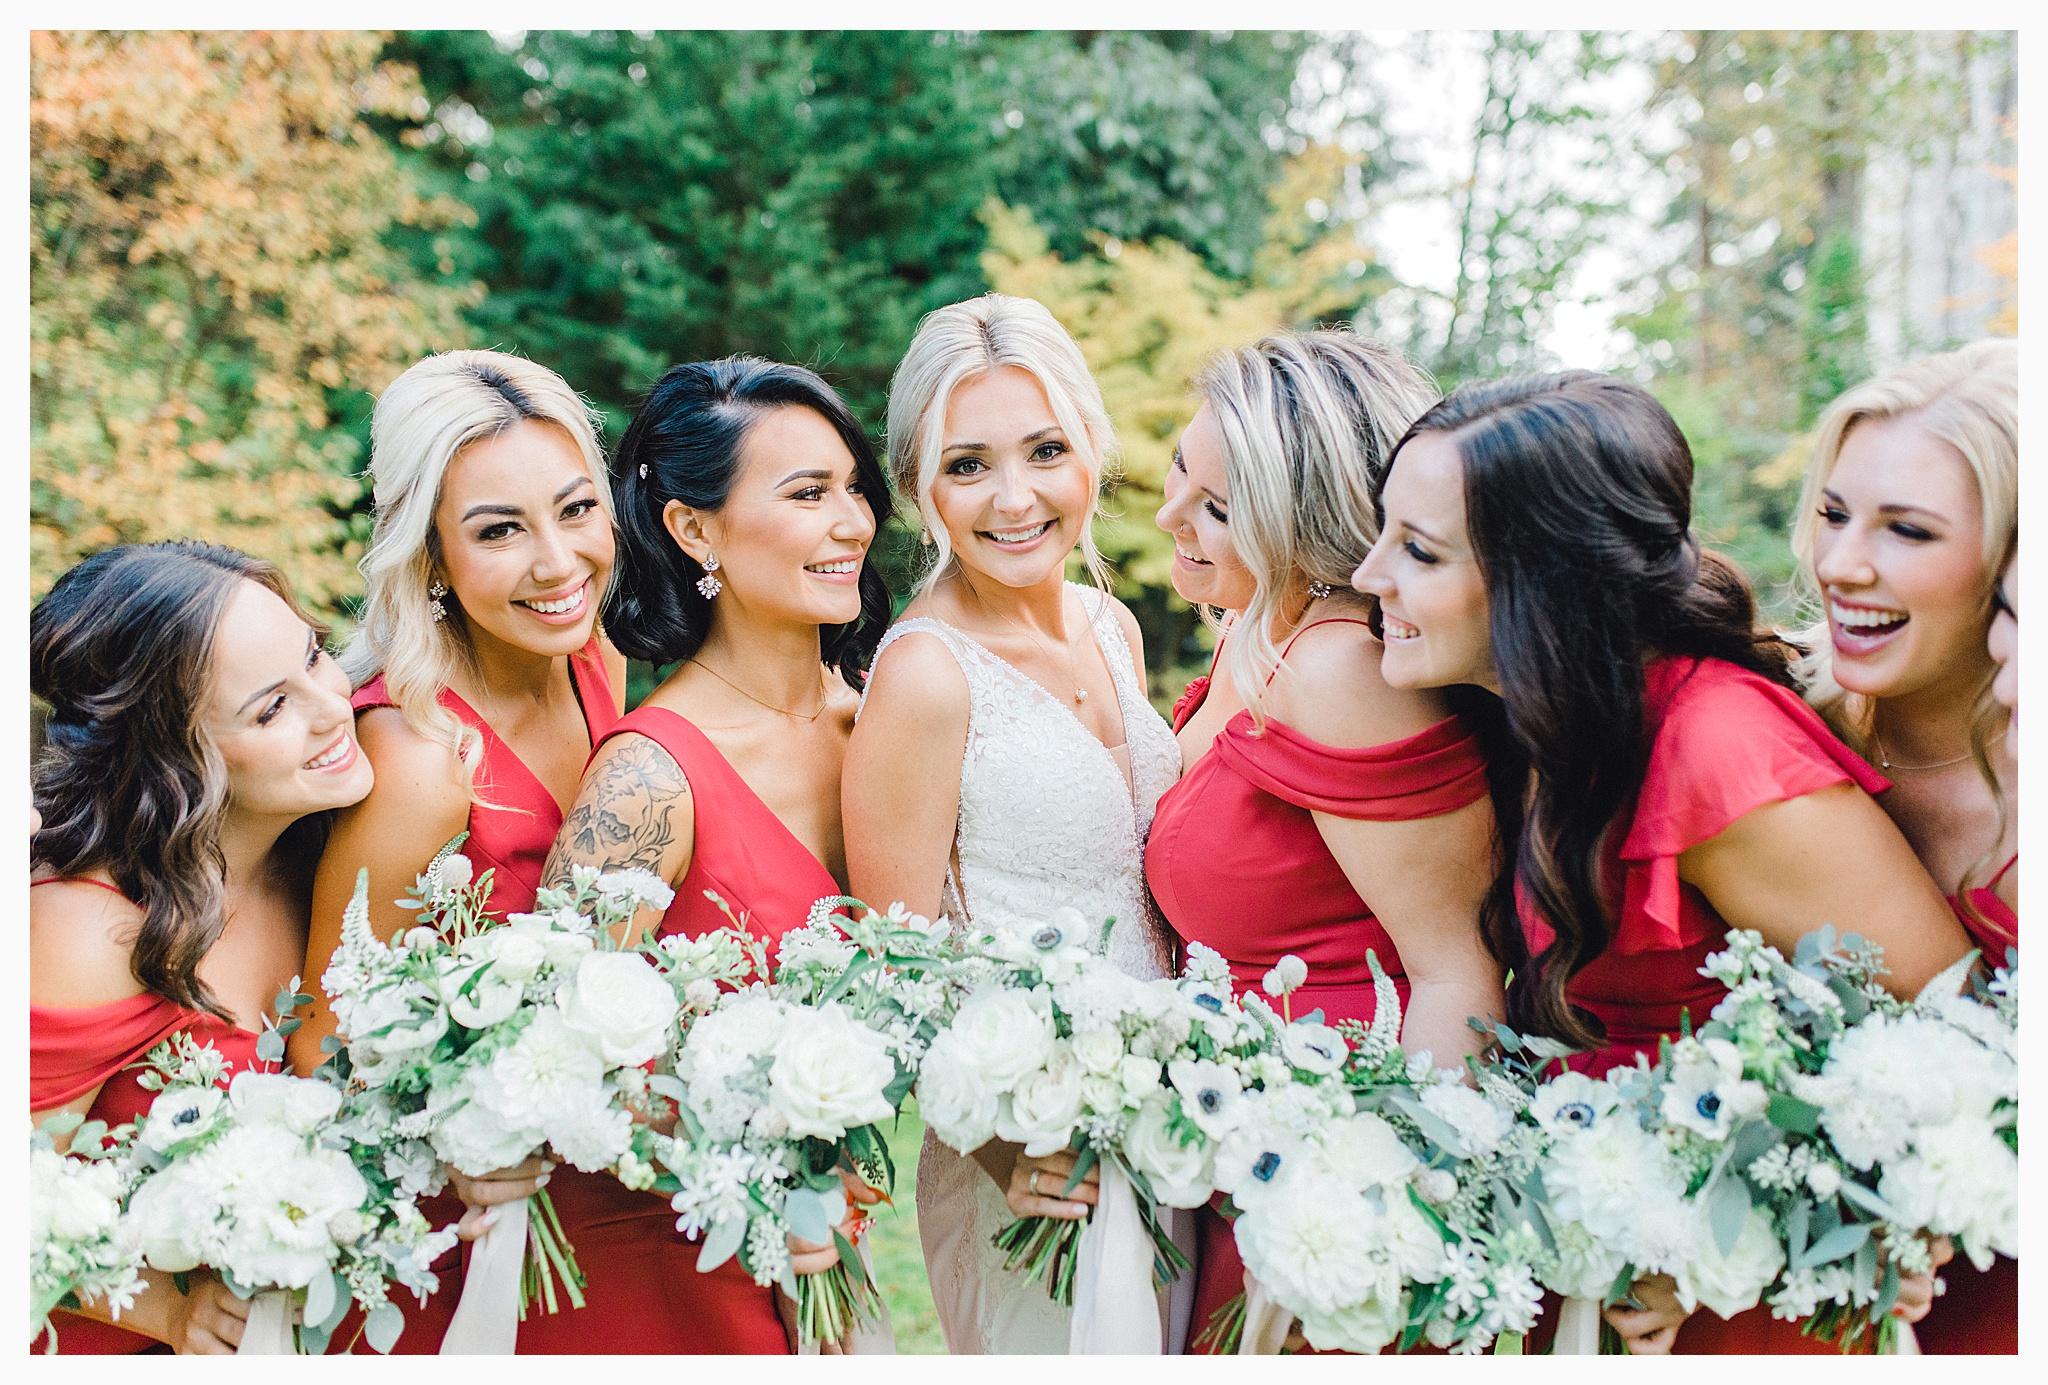 Emma Rose Company Light and Airy Wedding Photographer, Beautiful fall wedding at Rock Creek Gardens Venue in Puyallup, Washington._0055.jpg